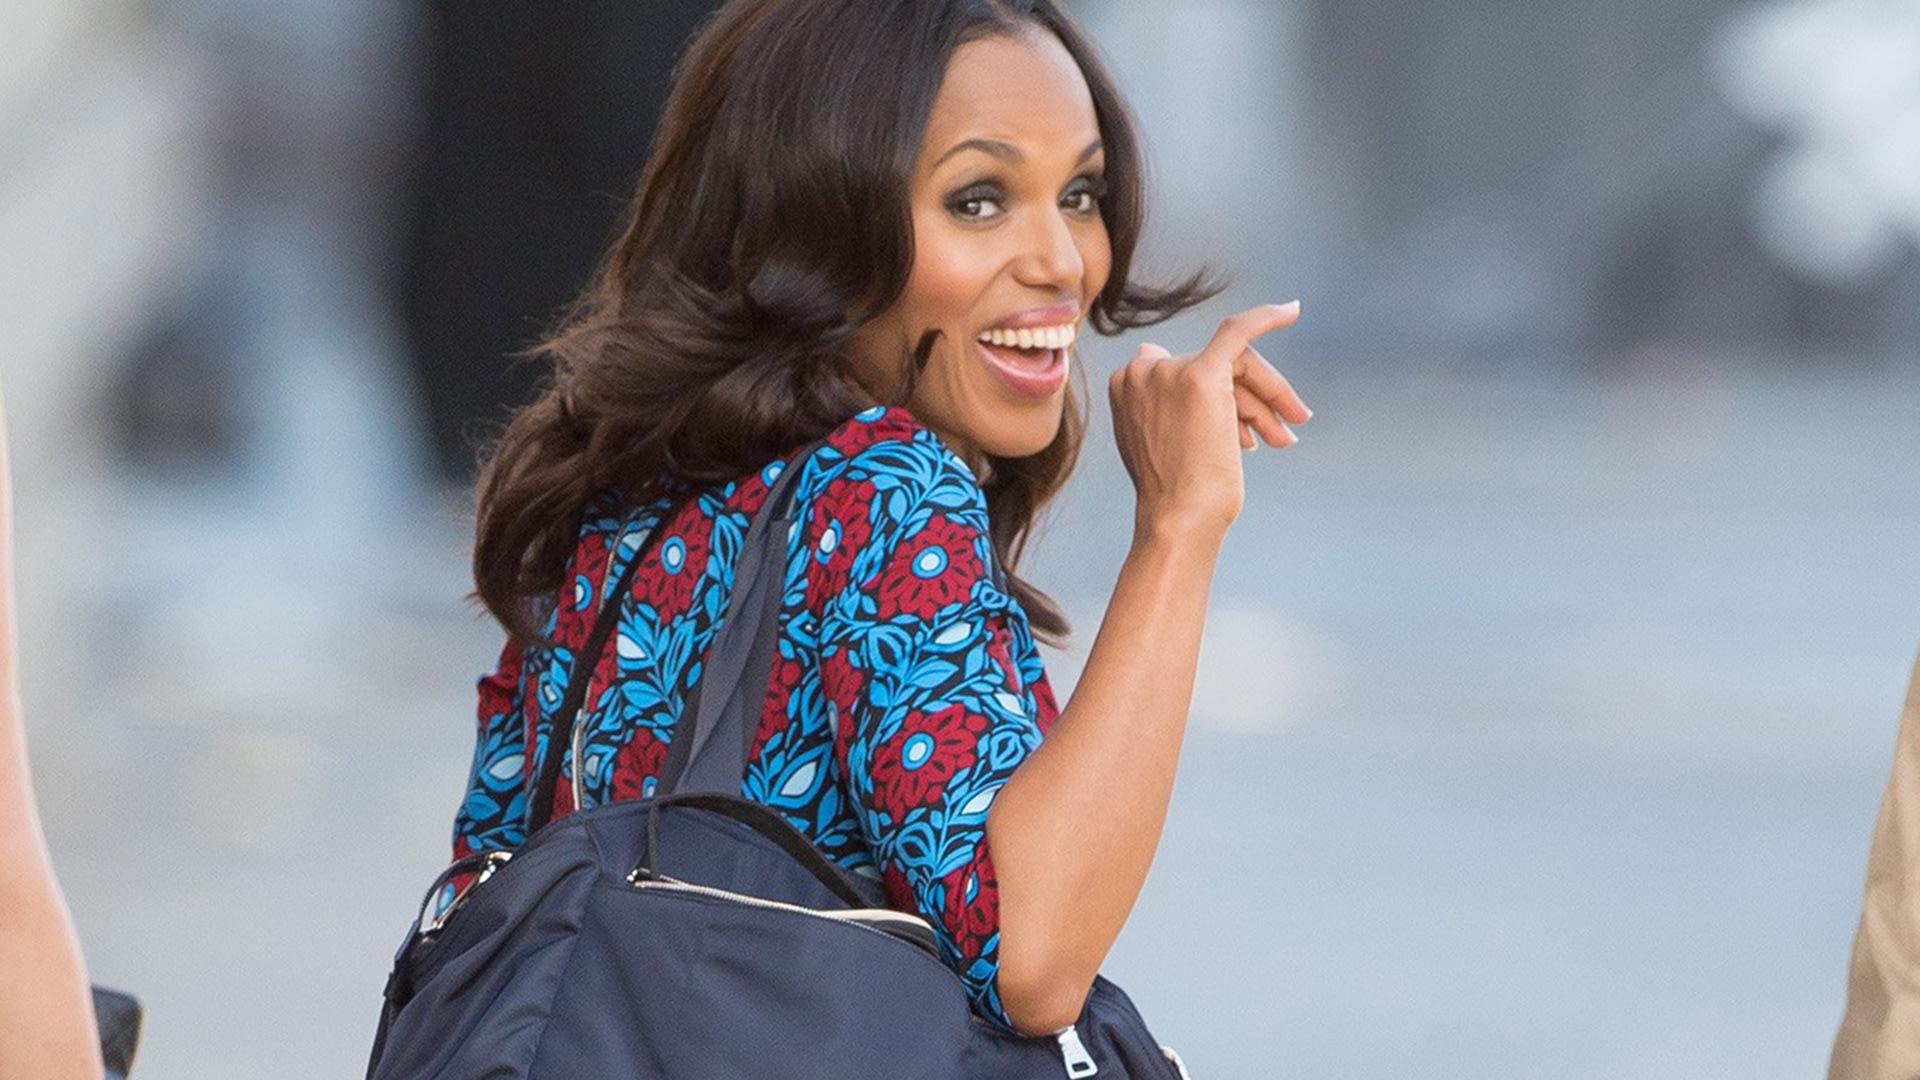 Image: Celebrity Sightings In Los Angeles - July 31, 2014